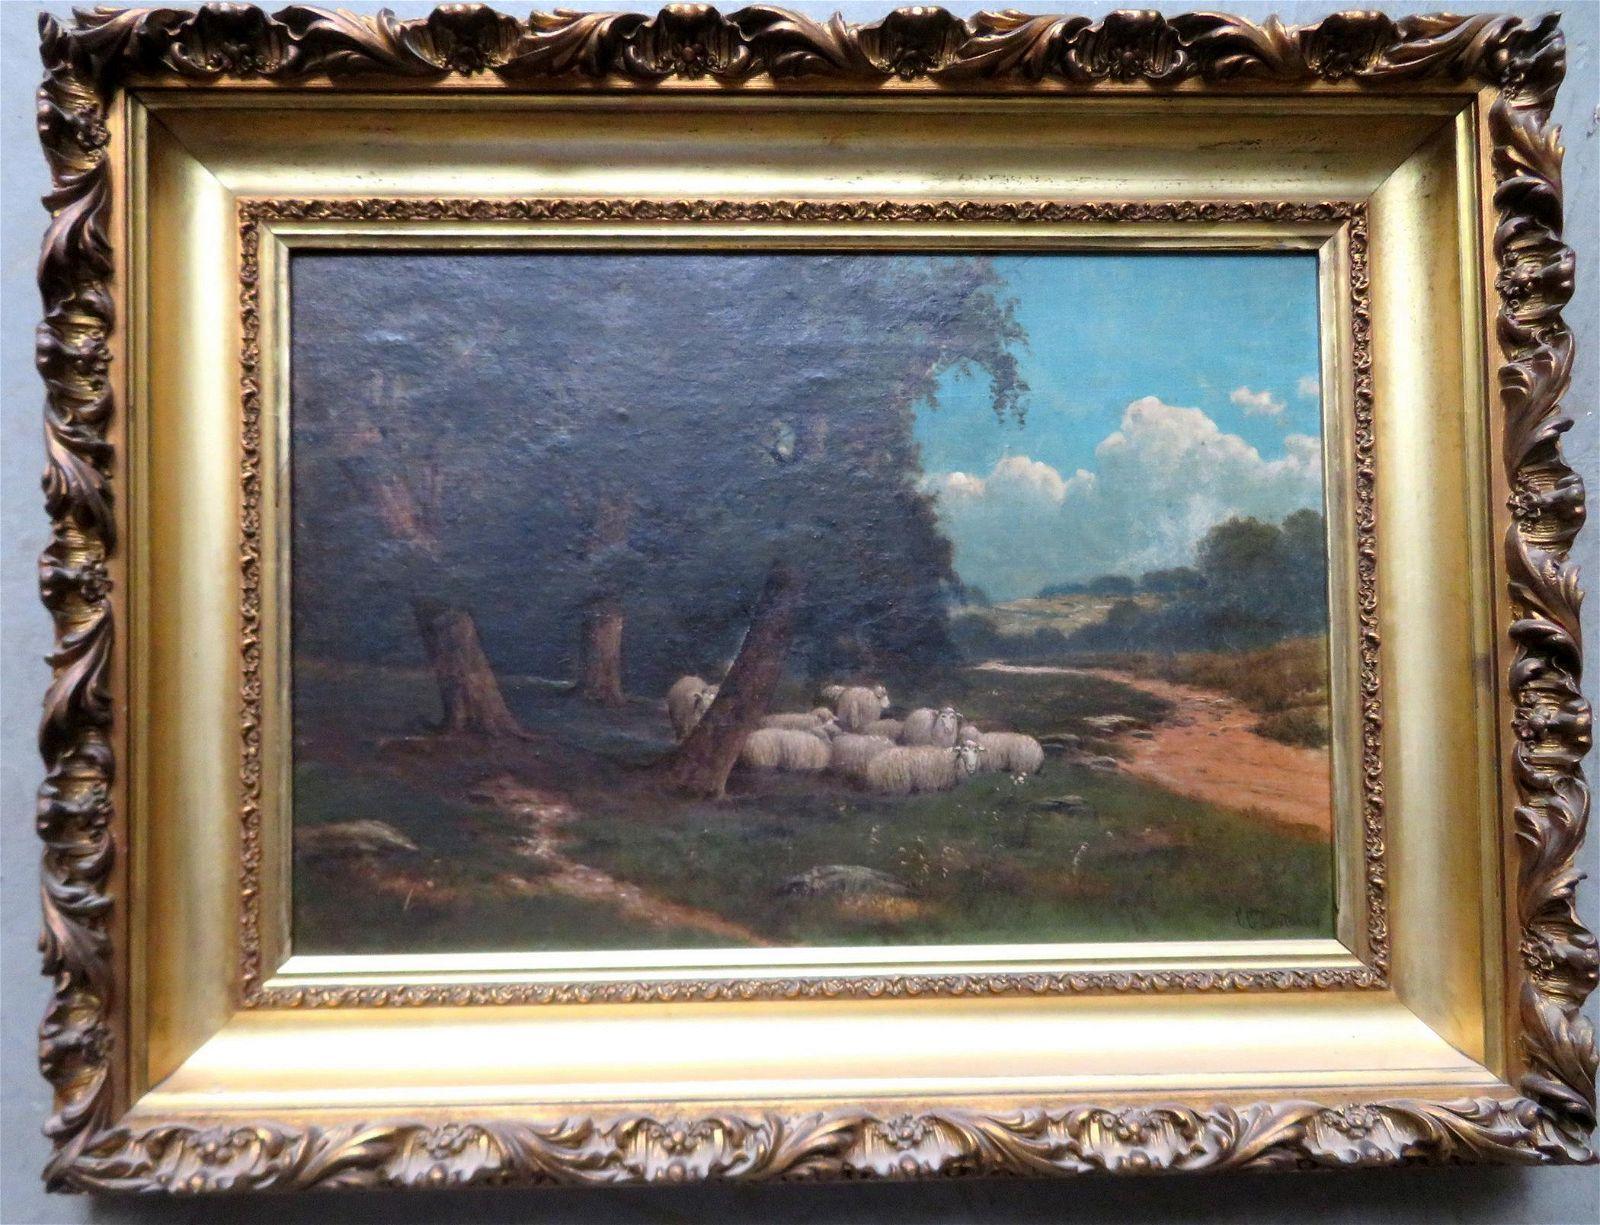 Charles Grant Davidson, NY, 1865-1945. A very fine O/C